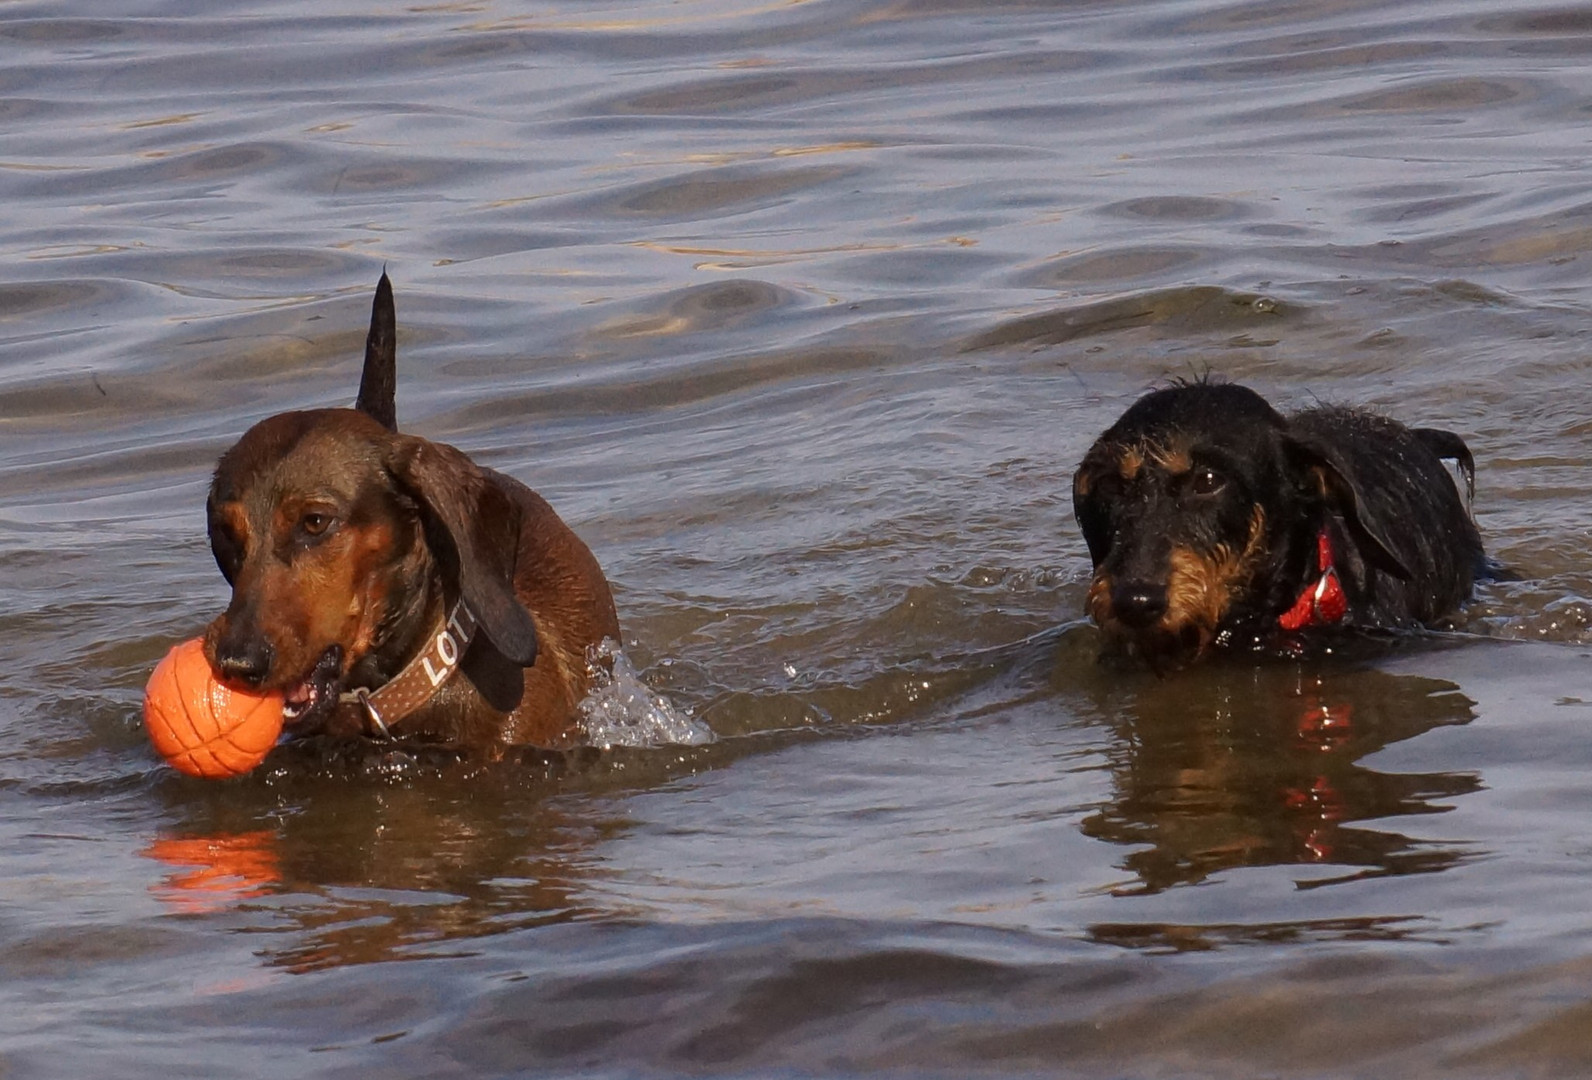 Badetag in der Ostsee